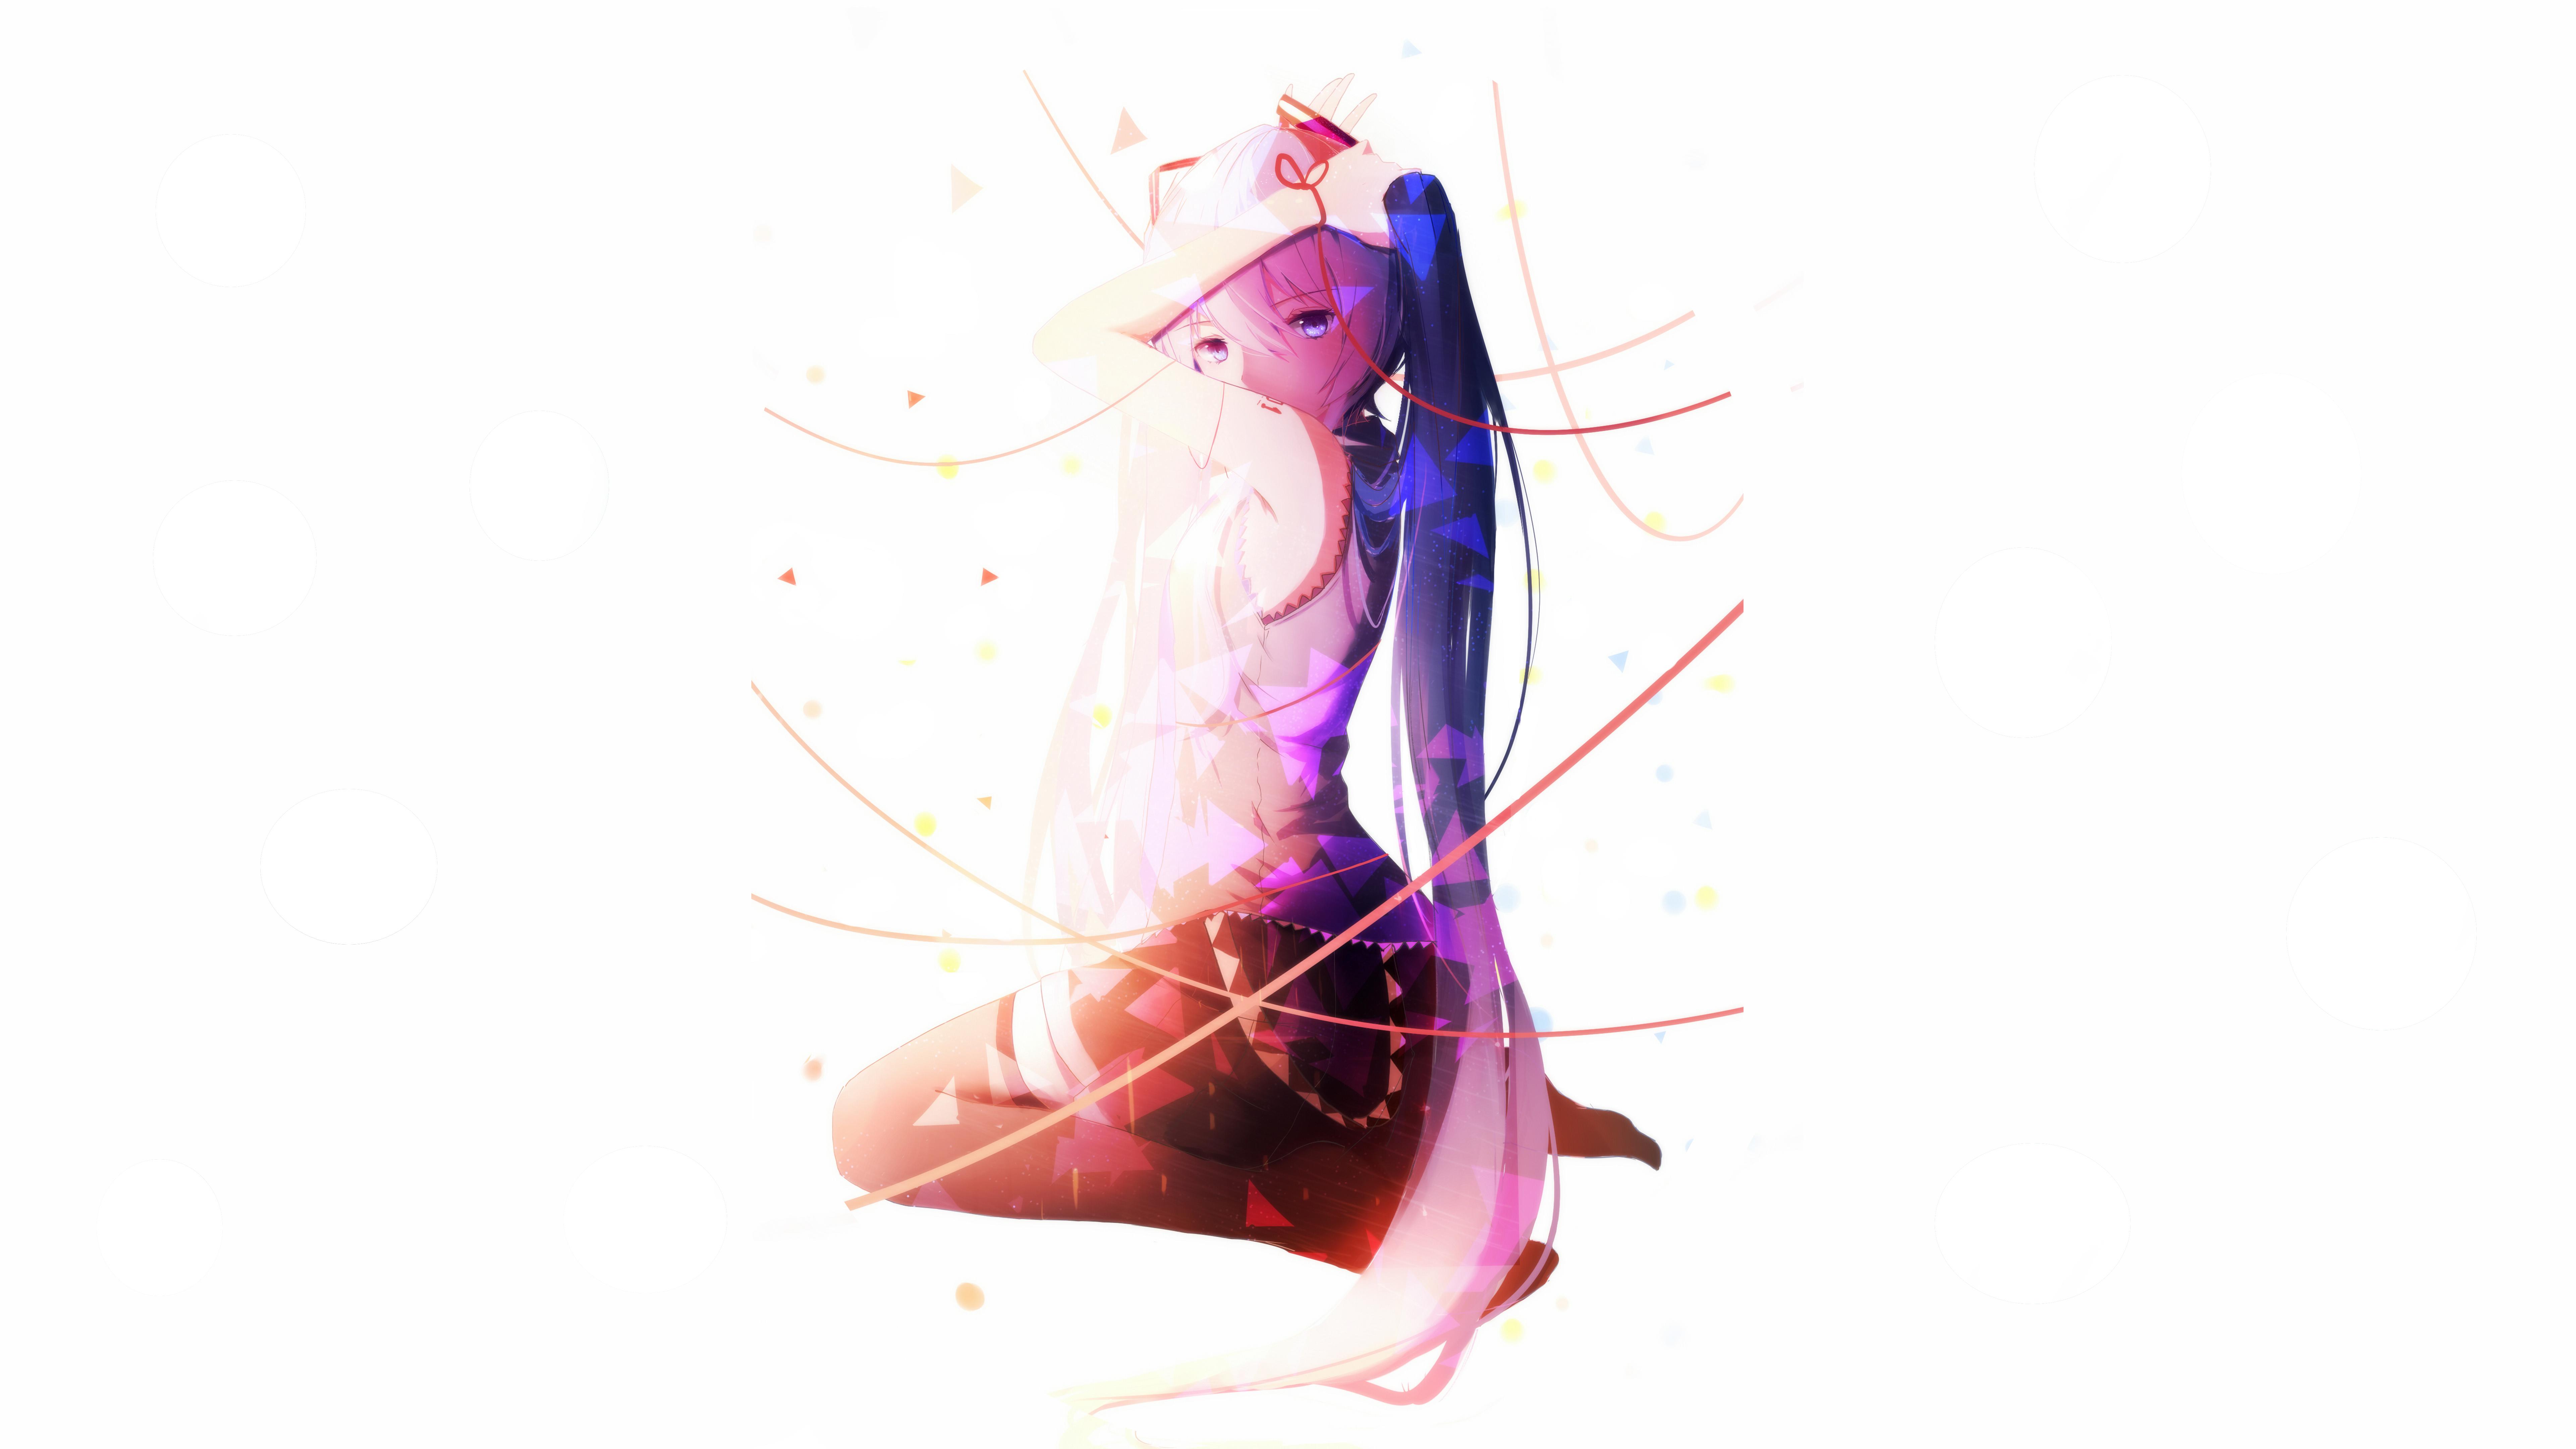 Hatsune Miku Vocaloid Girl 8k, HD Anime, 4k Wallpapers